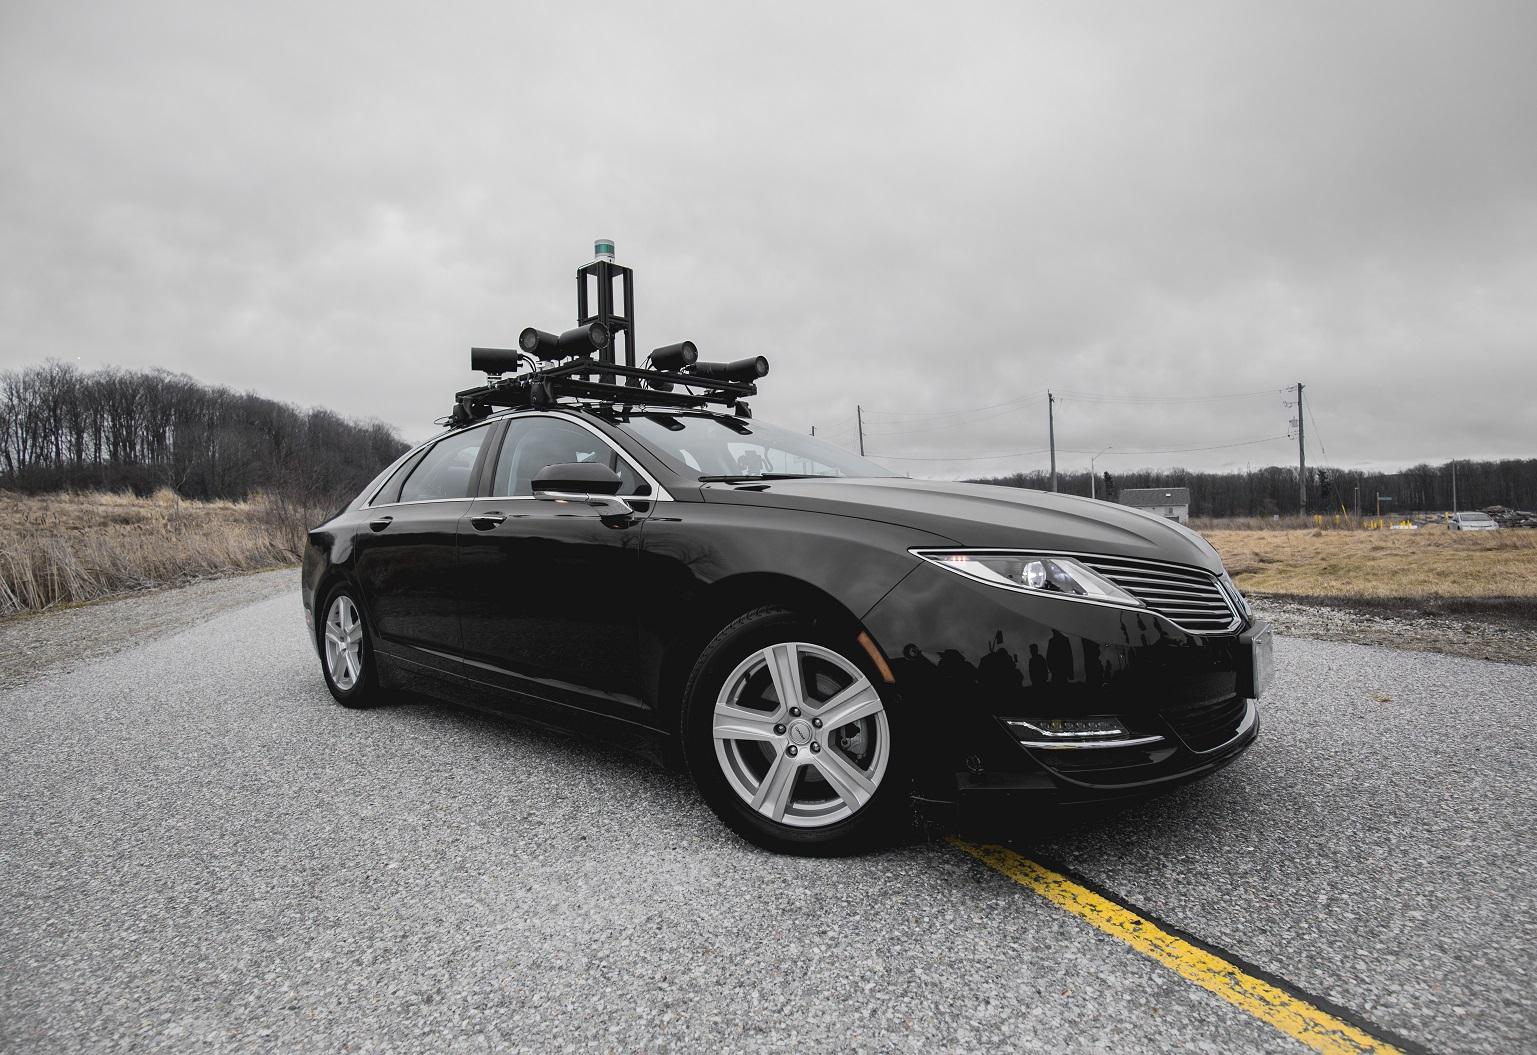 The Autonomoose self-driving car.